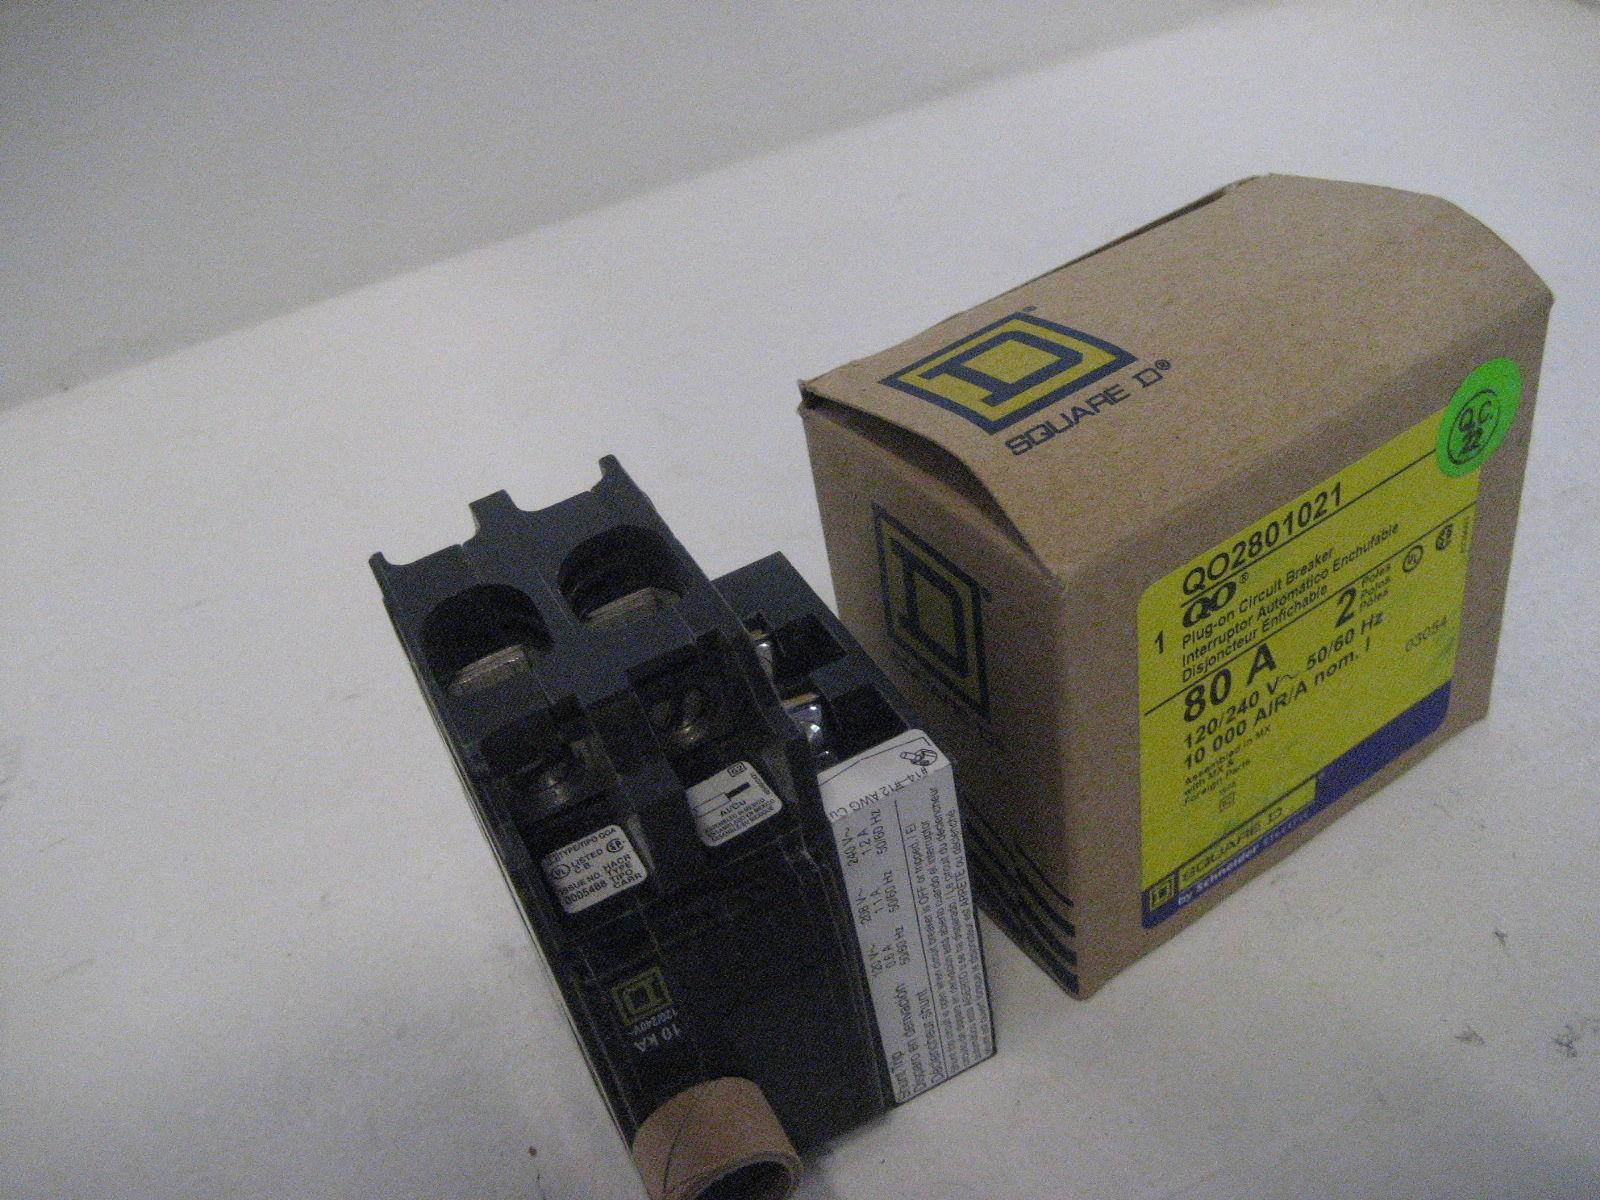 New Square D Shunt Trip Breaker Qo2801021 2 Pole 80 Amp Qo How Do Breakers Work